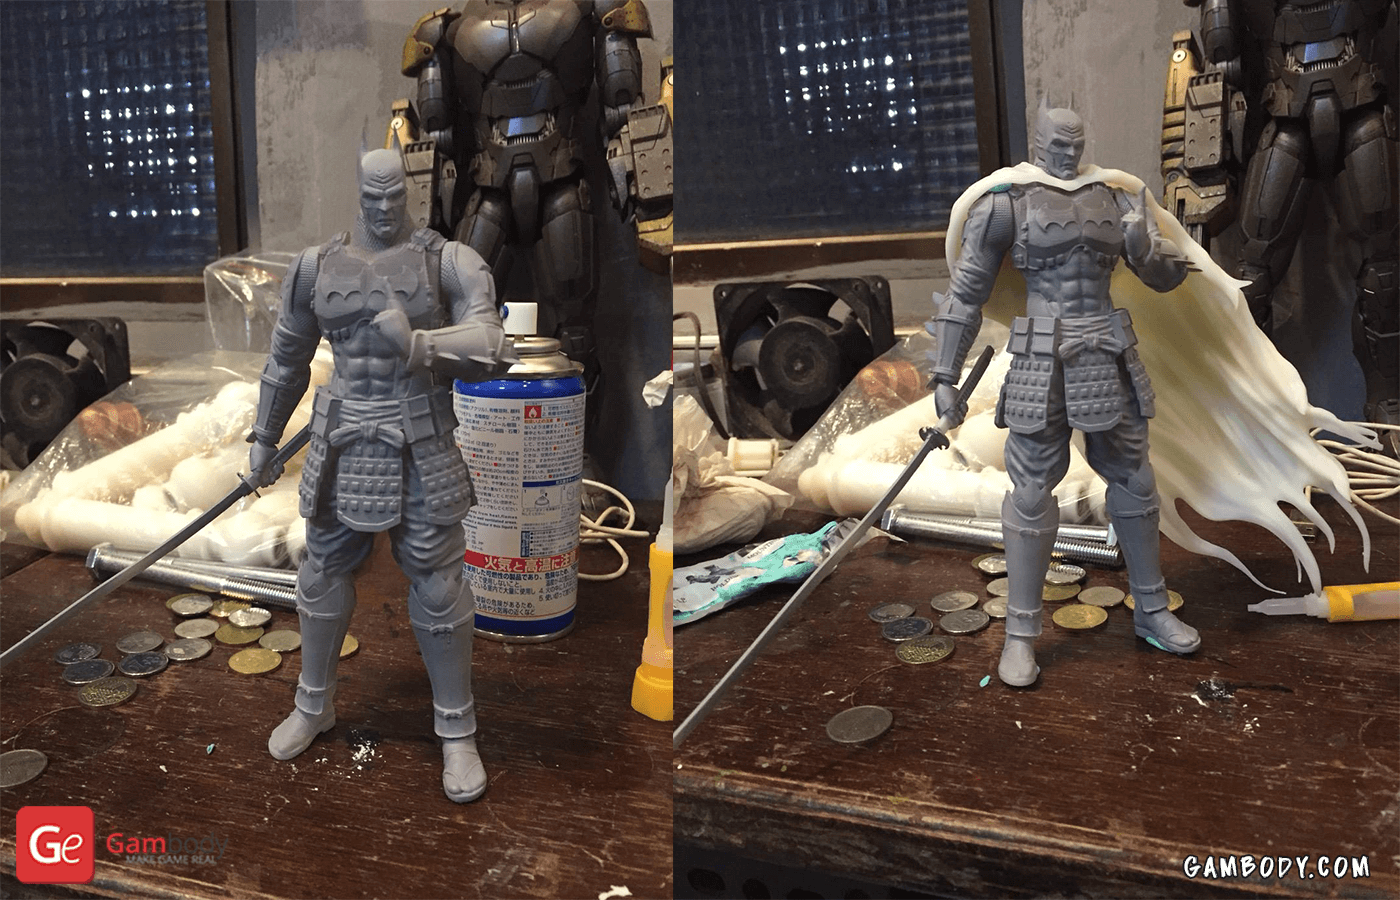 Batman Ninja 3D Prining Figure